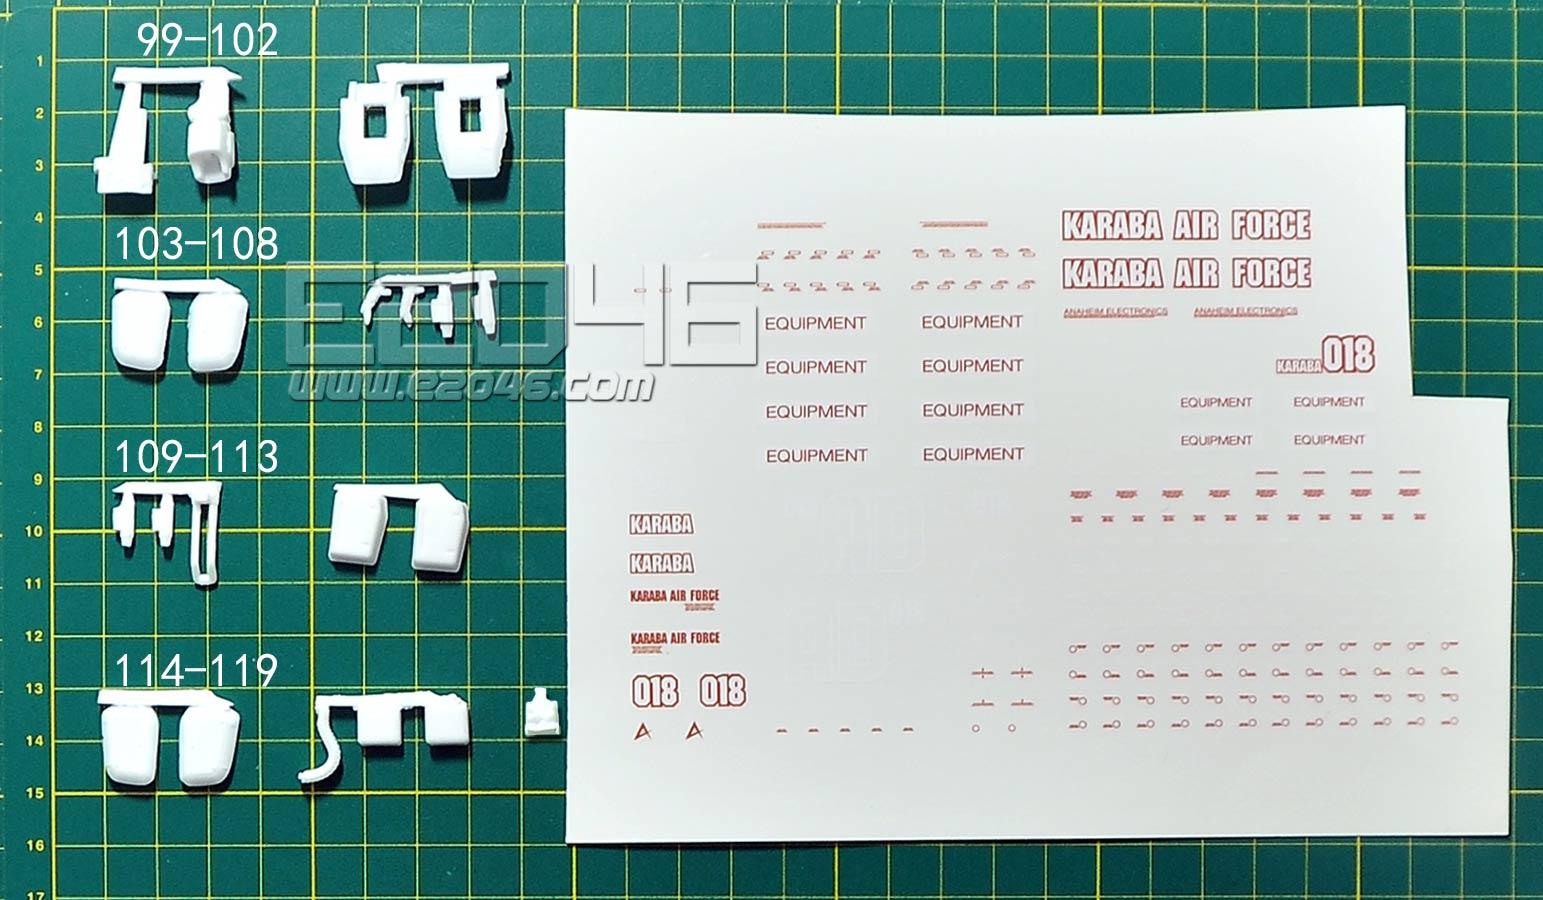 MSZ-006C1 Hummingbird